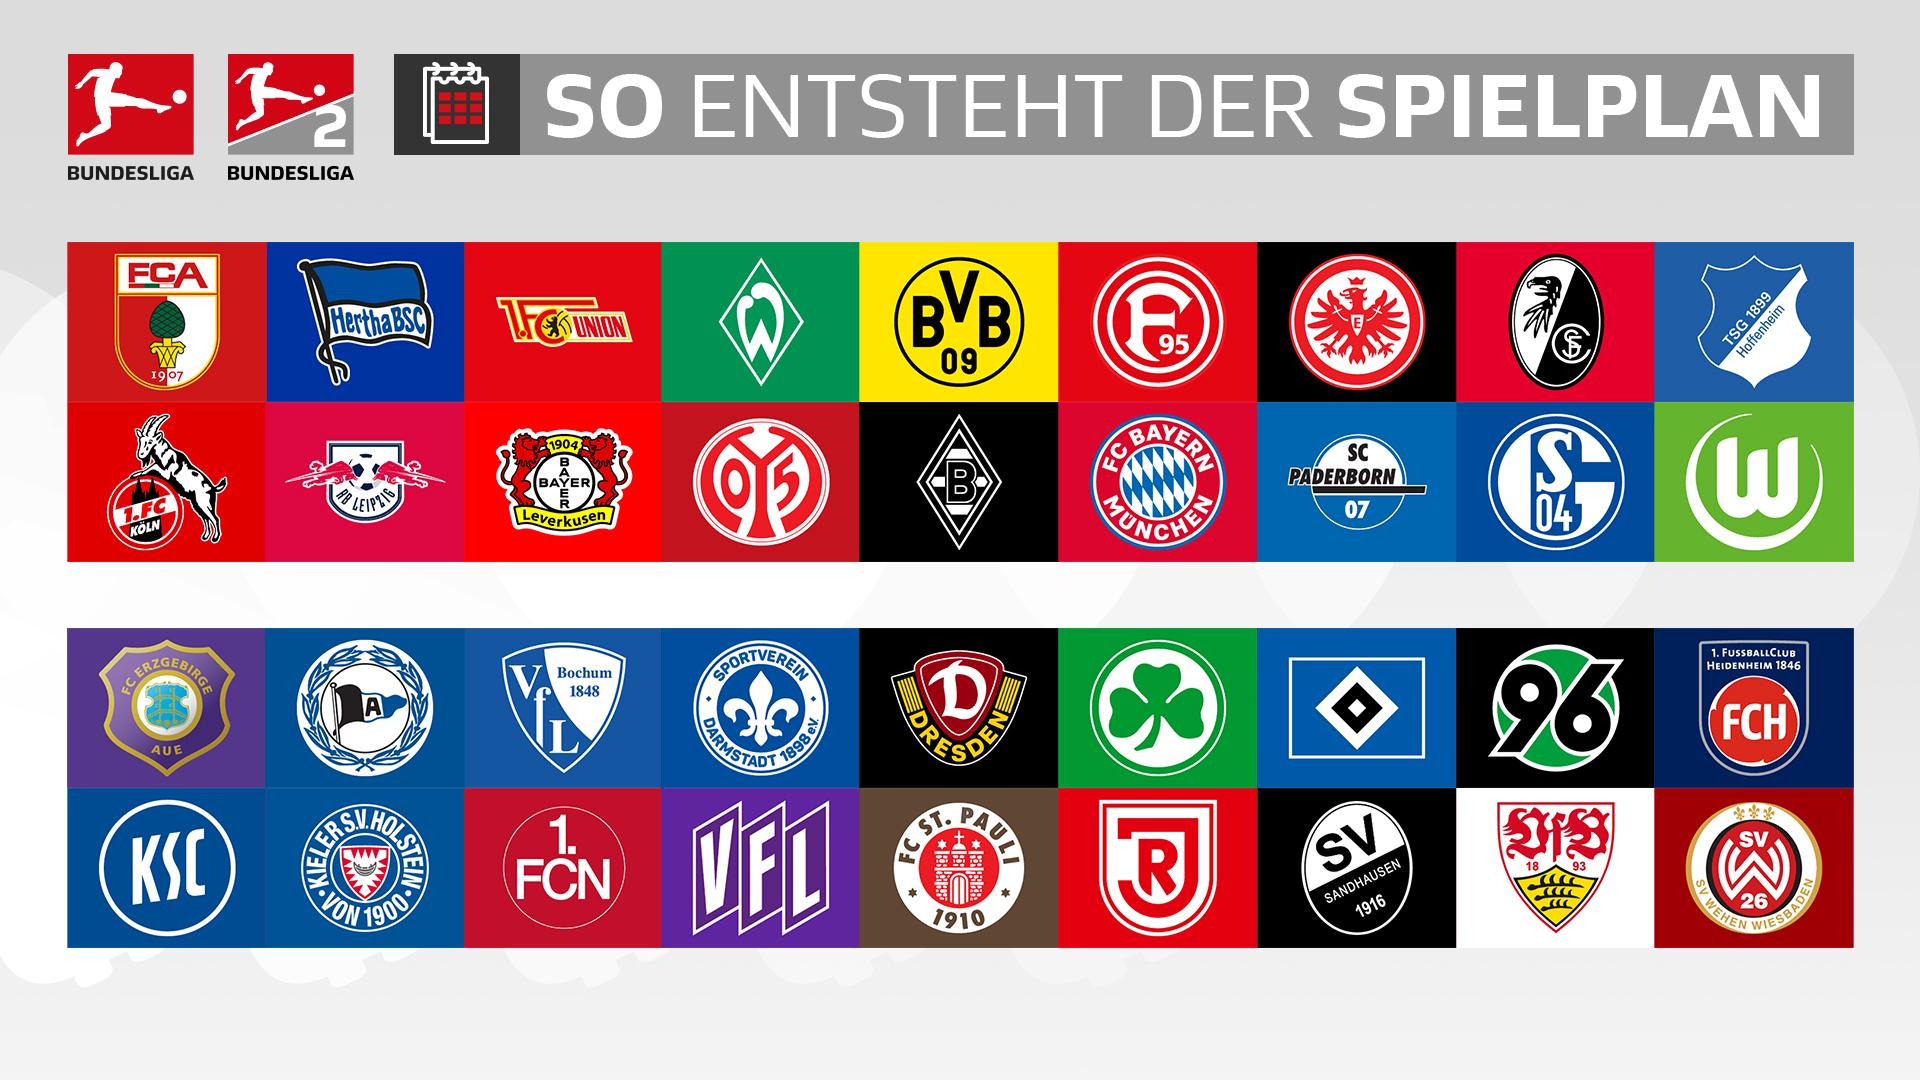 2. Deutsche Bundesliga